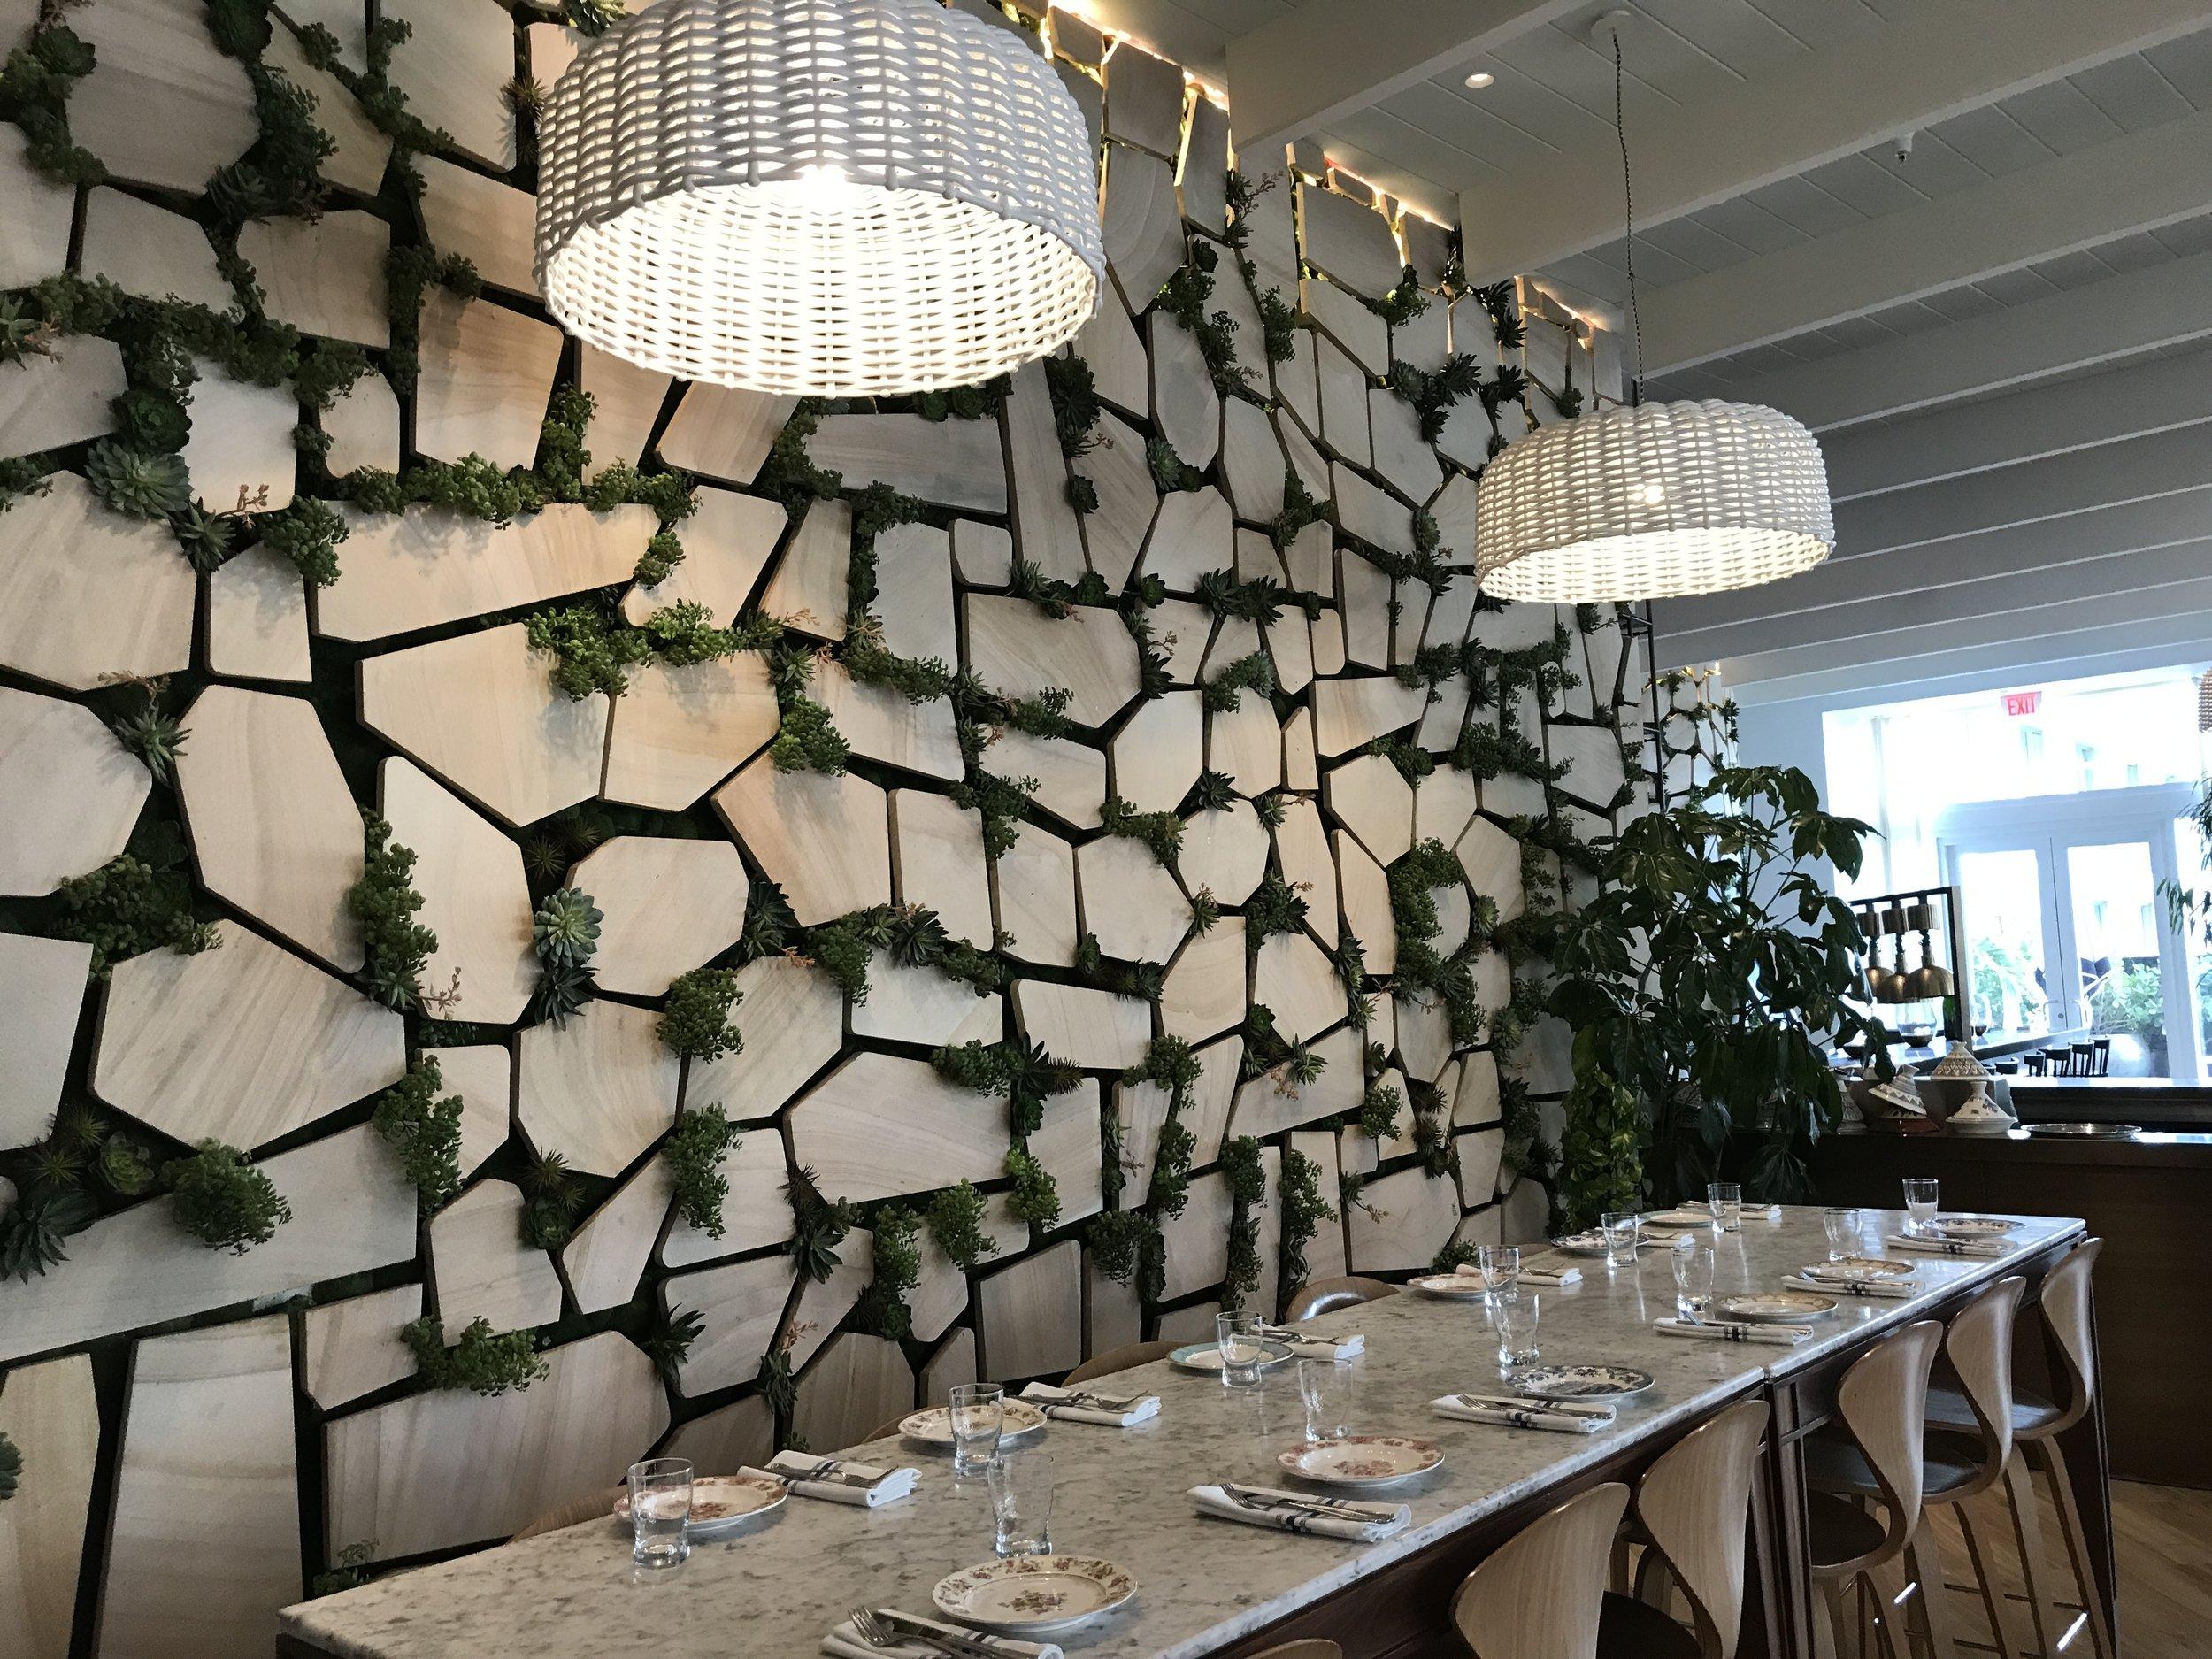 Cleo Restaurant_PDG_Tenant Improvement3.JPG